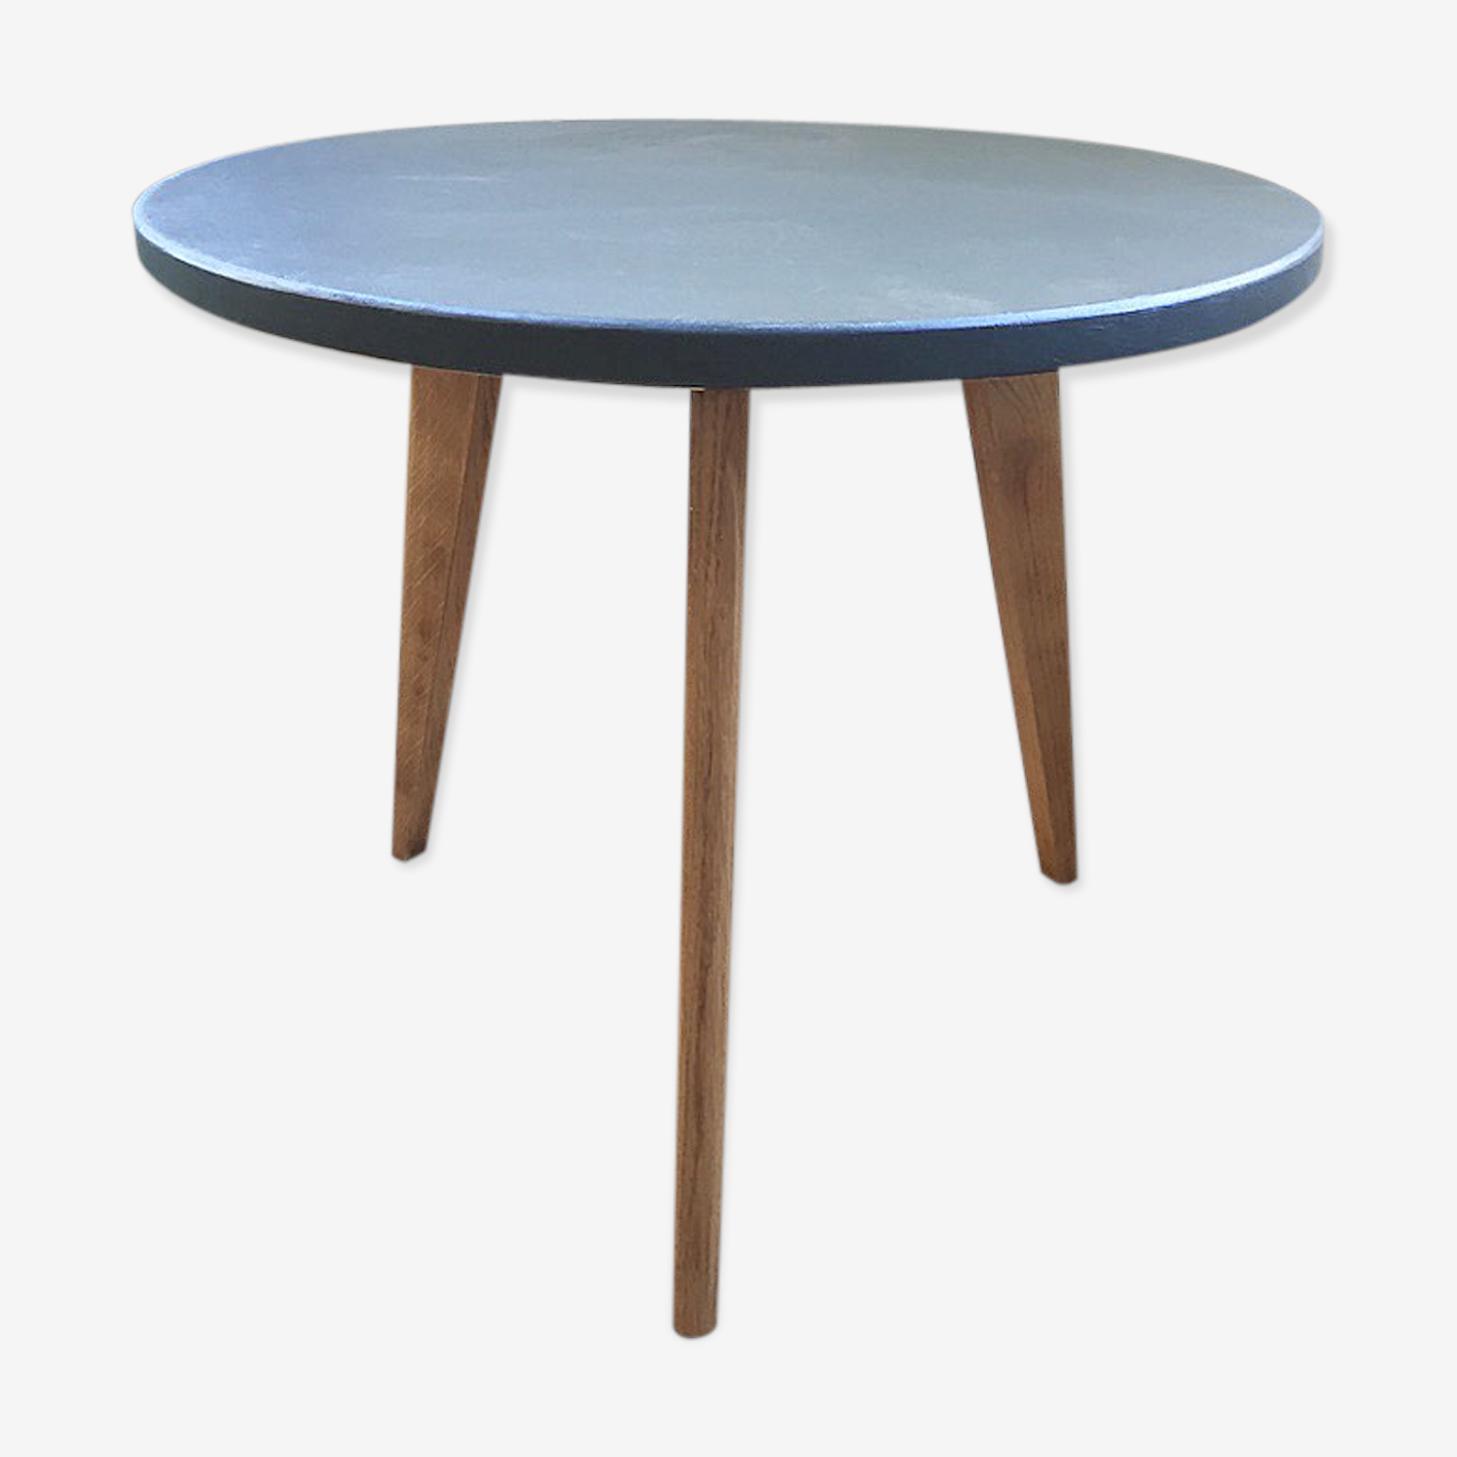 Green tripod table